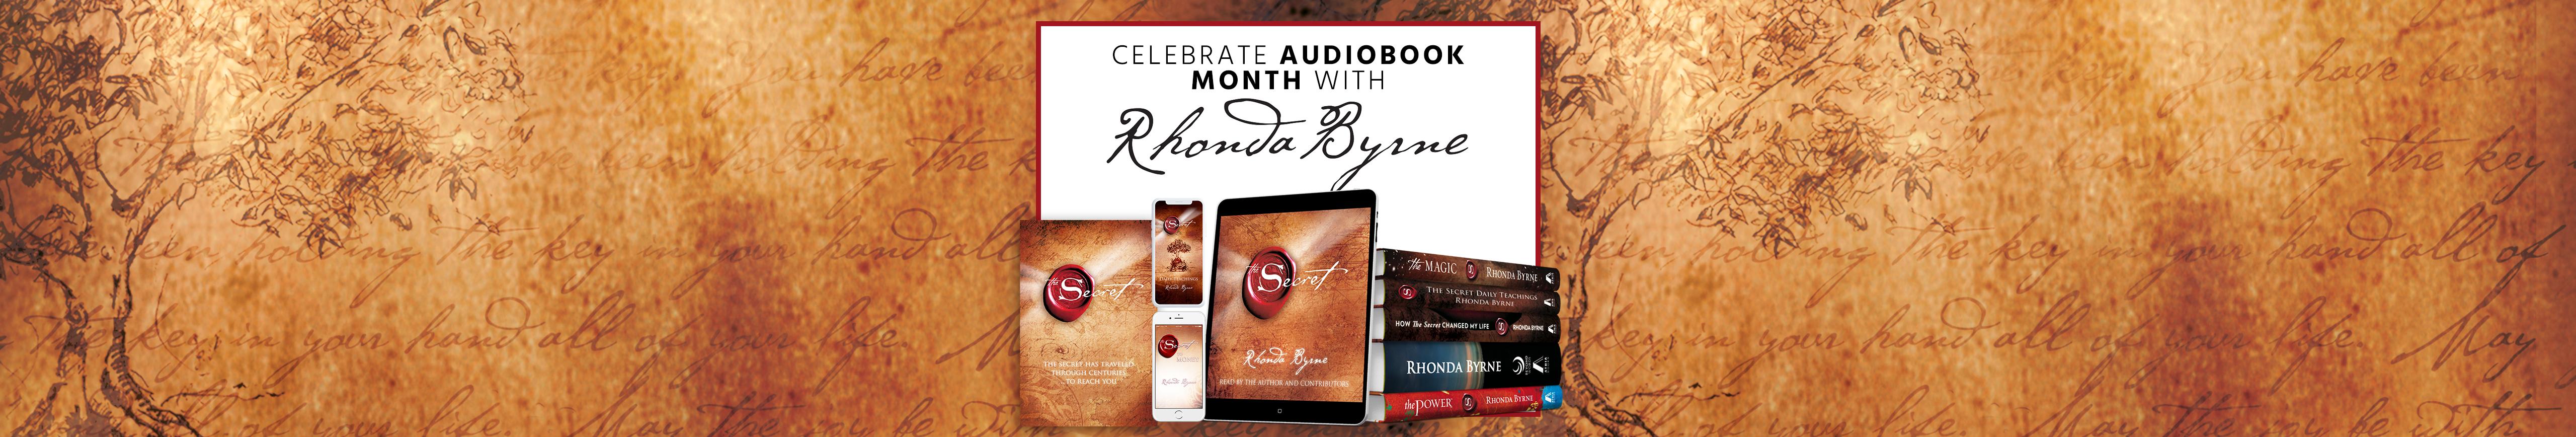 CELEBRATE AUDIOBOOK MONTH WITH RHONDA BYRNE